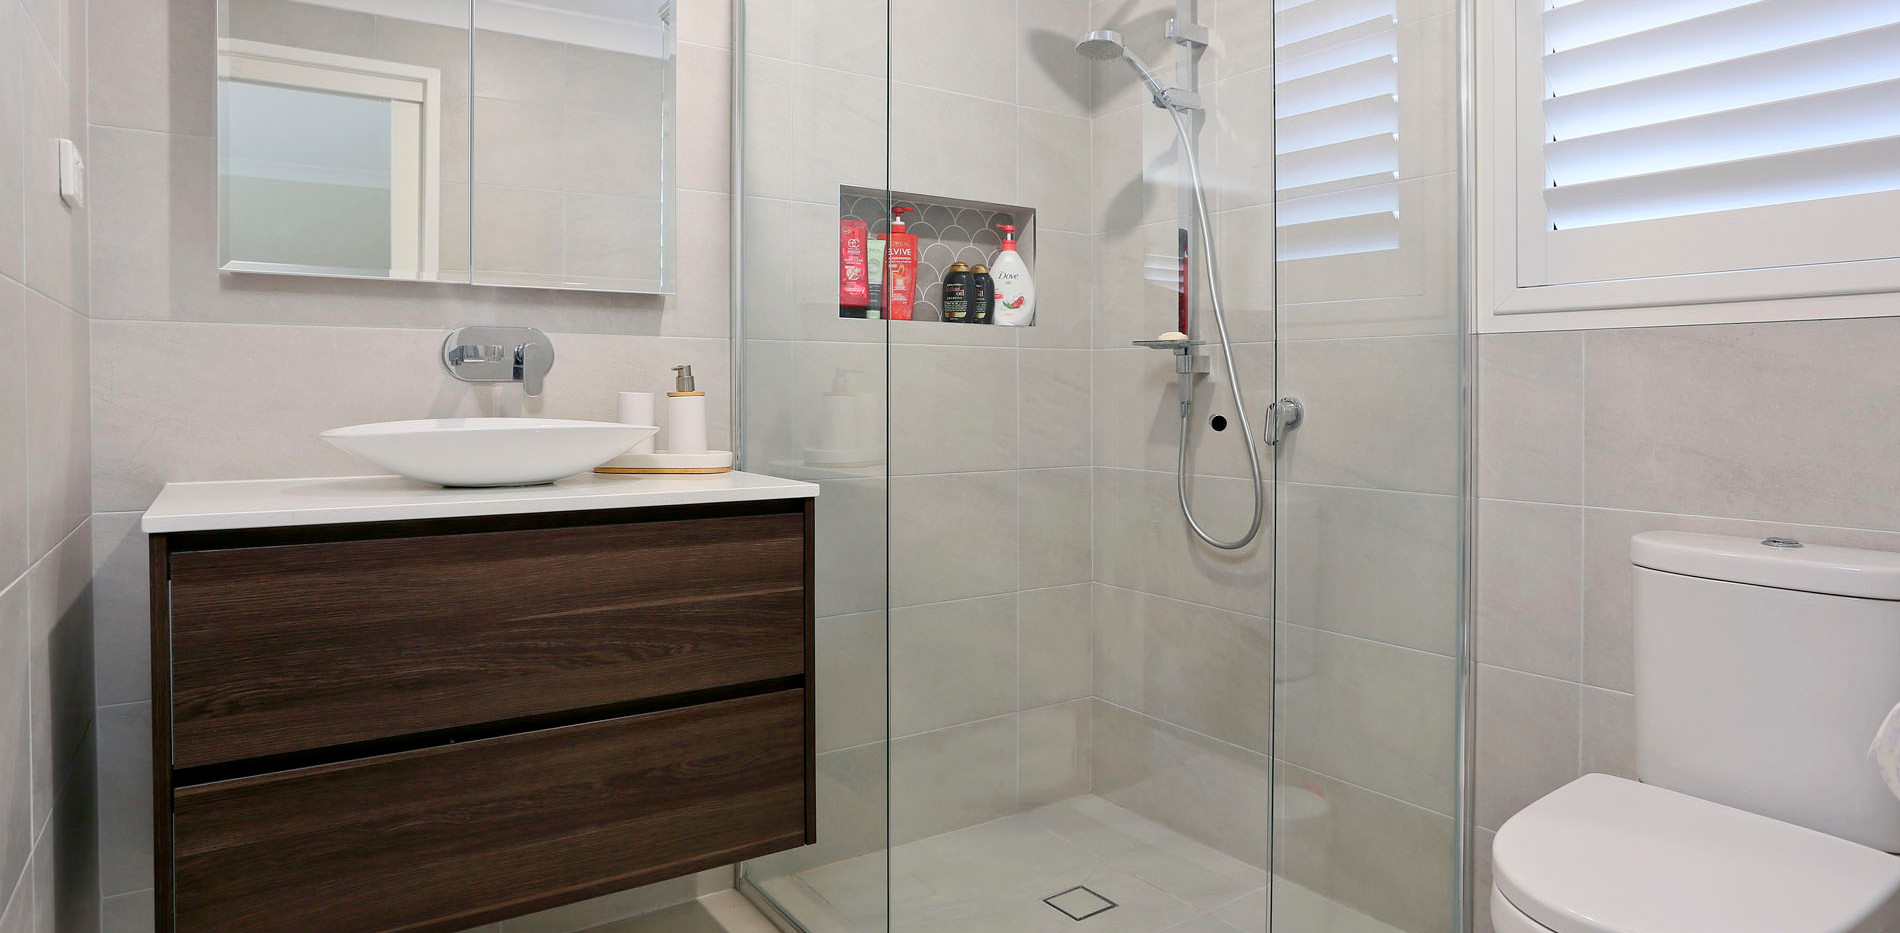 Hawkesbury bathrooms and Kitchens (16)